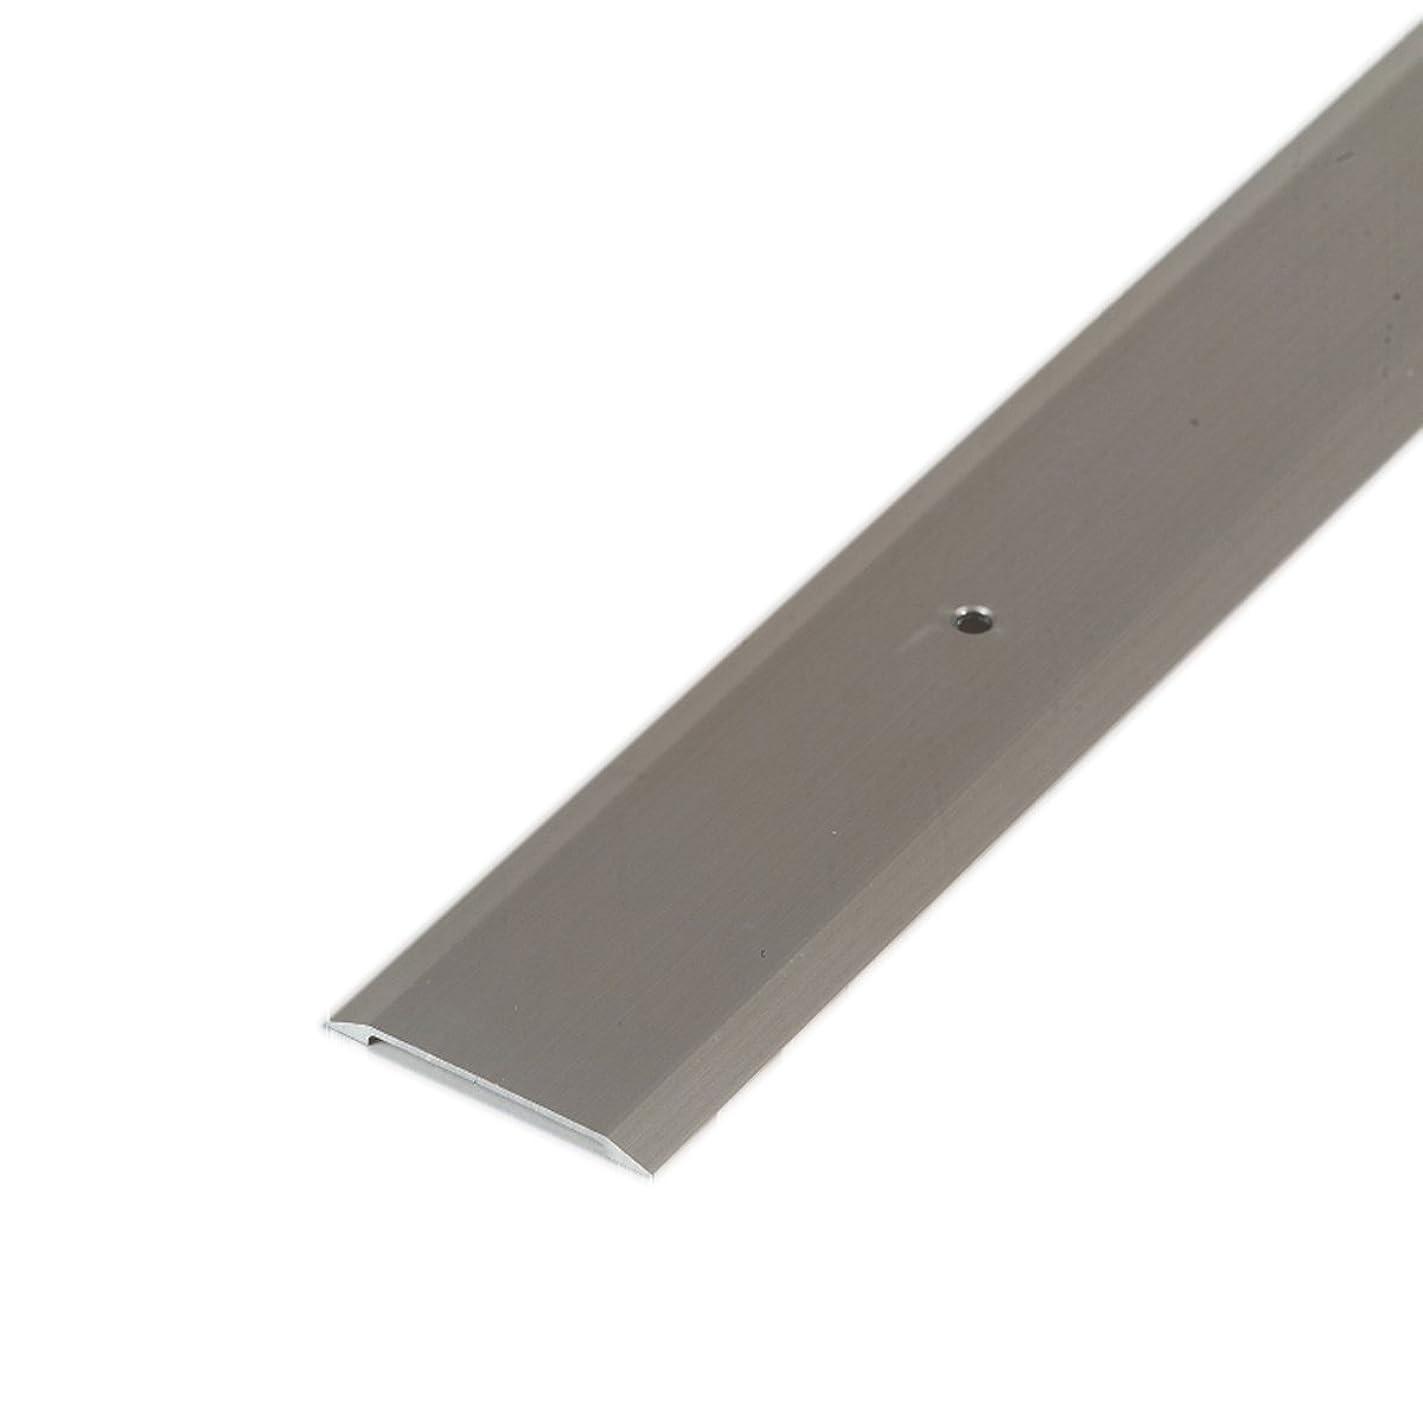 M-D Building Products 49010 M-D Premium Flat Saddle Threshold, 36 in L X 1-3/4 in W X 1/8 in H, Aluminum, x 1-3/4